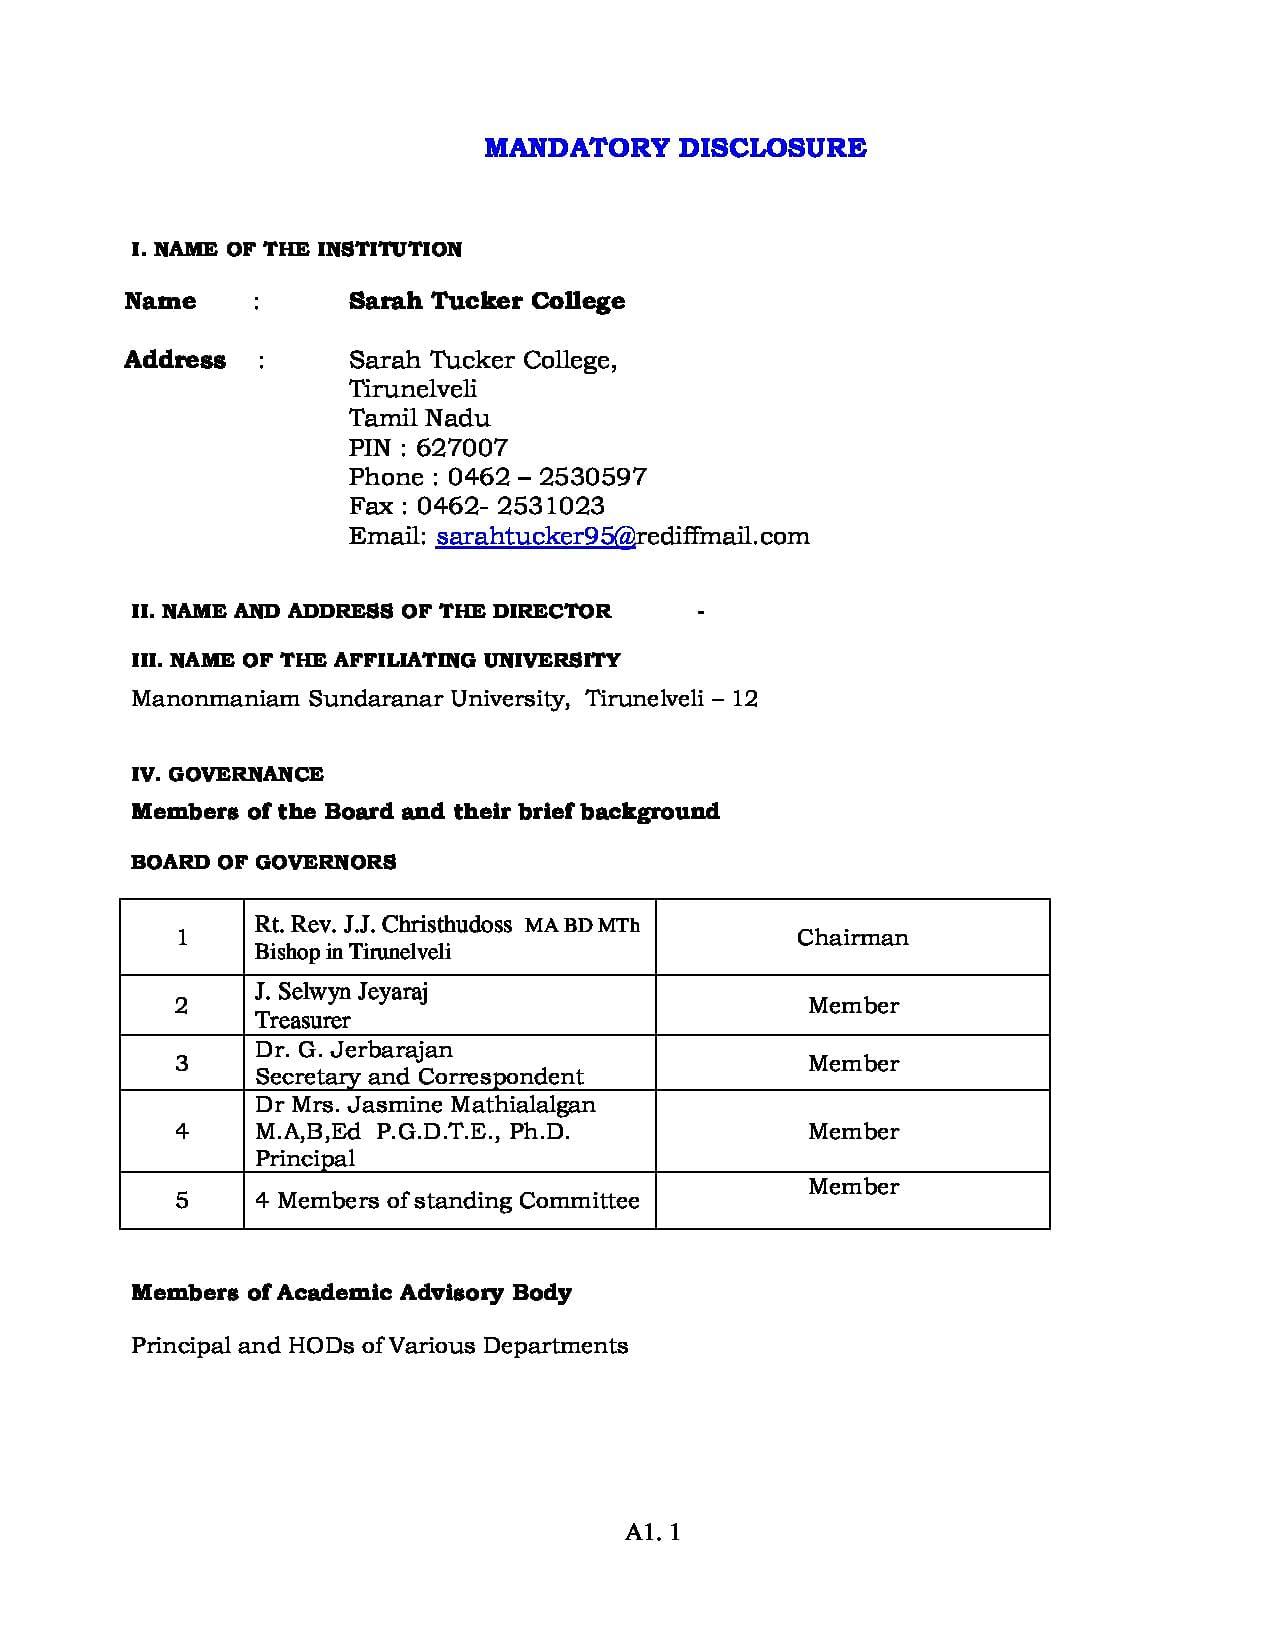 Sarah tucker college tirunelveli admissions contact website sarah tucker college tirunelveli mandatory disclosure mca image 1 aiddatafo Image collections